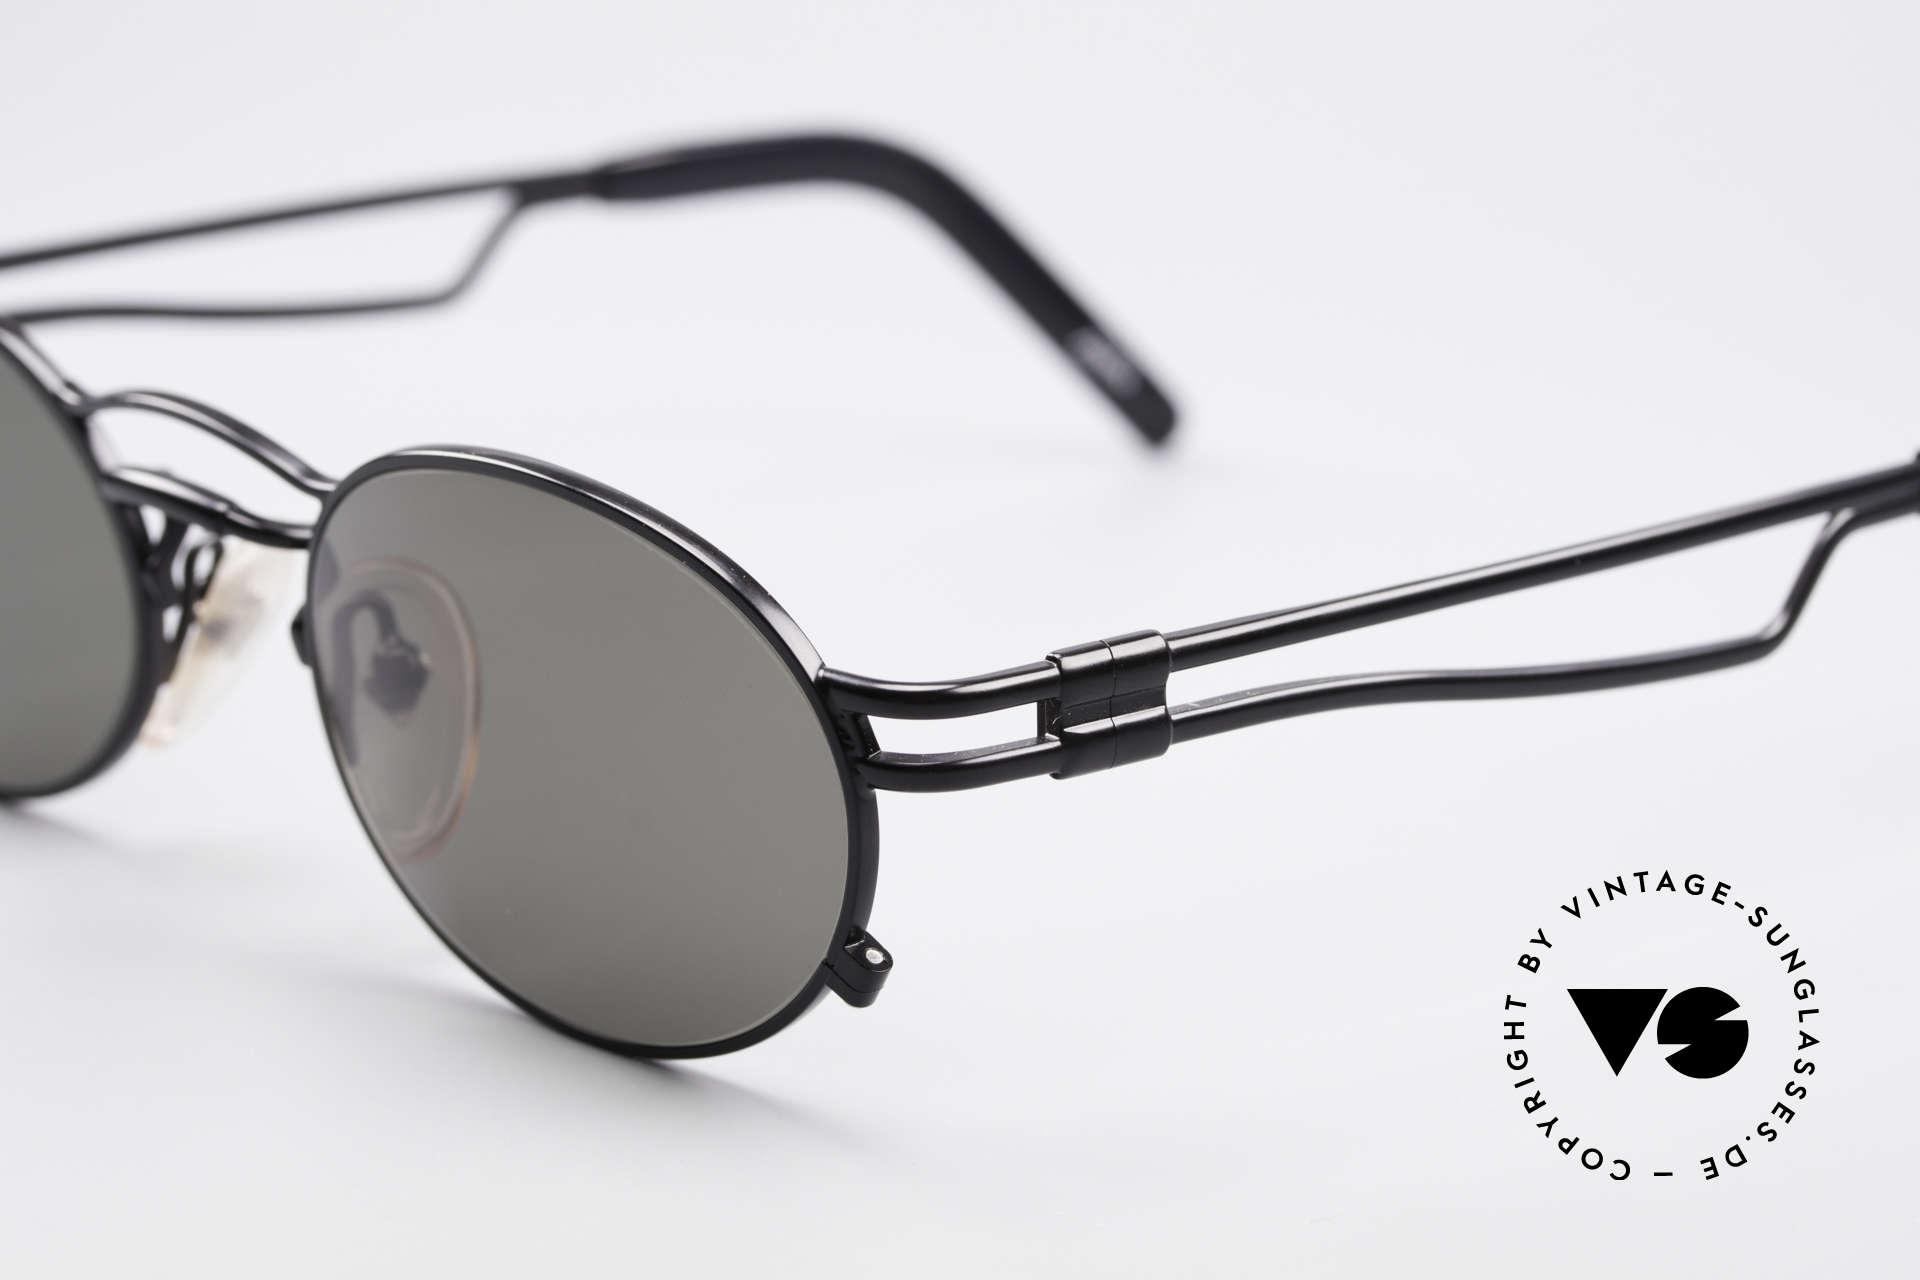 Jean Paul Gaultier 56-3173 Oval Vintage Sunglasses, dark green/gray sun lenses for 100% UV protection, Made for Men and Women